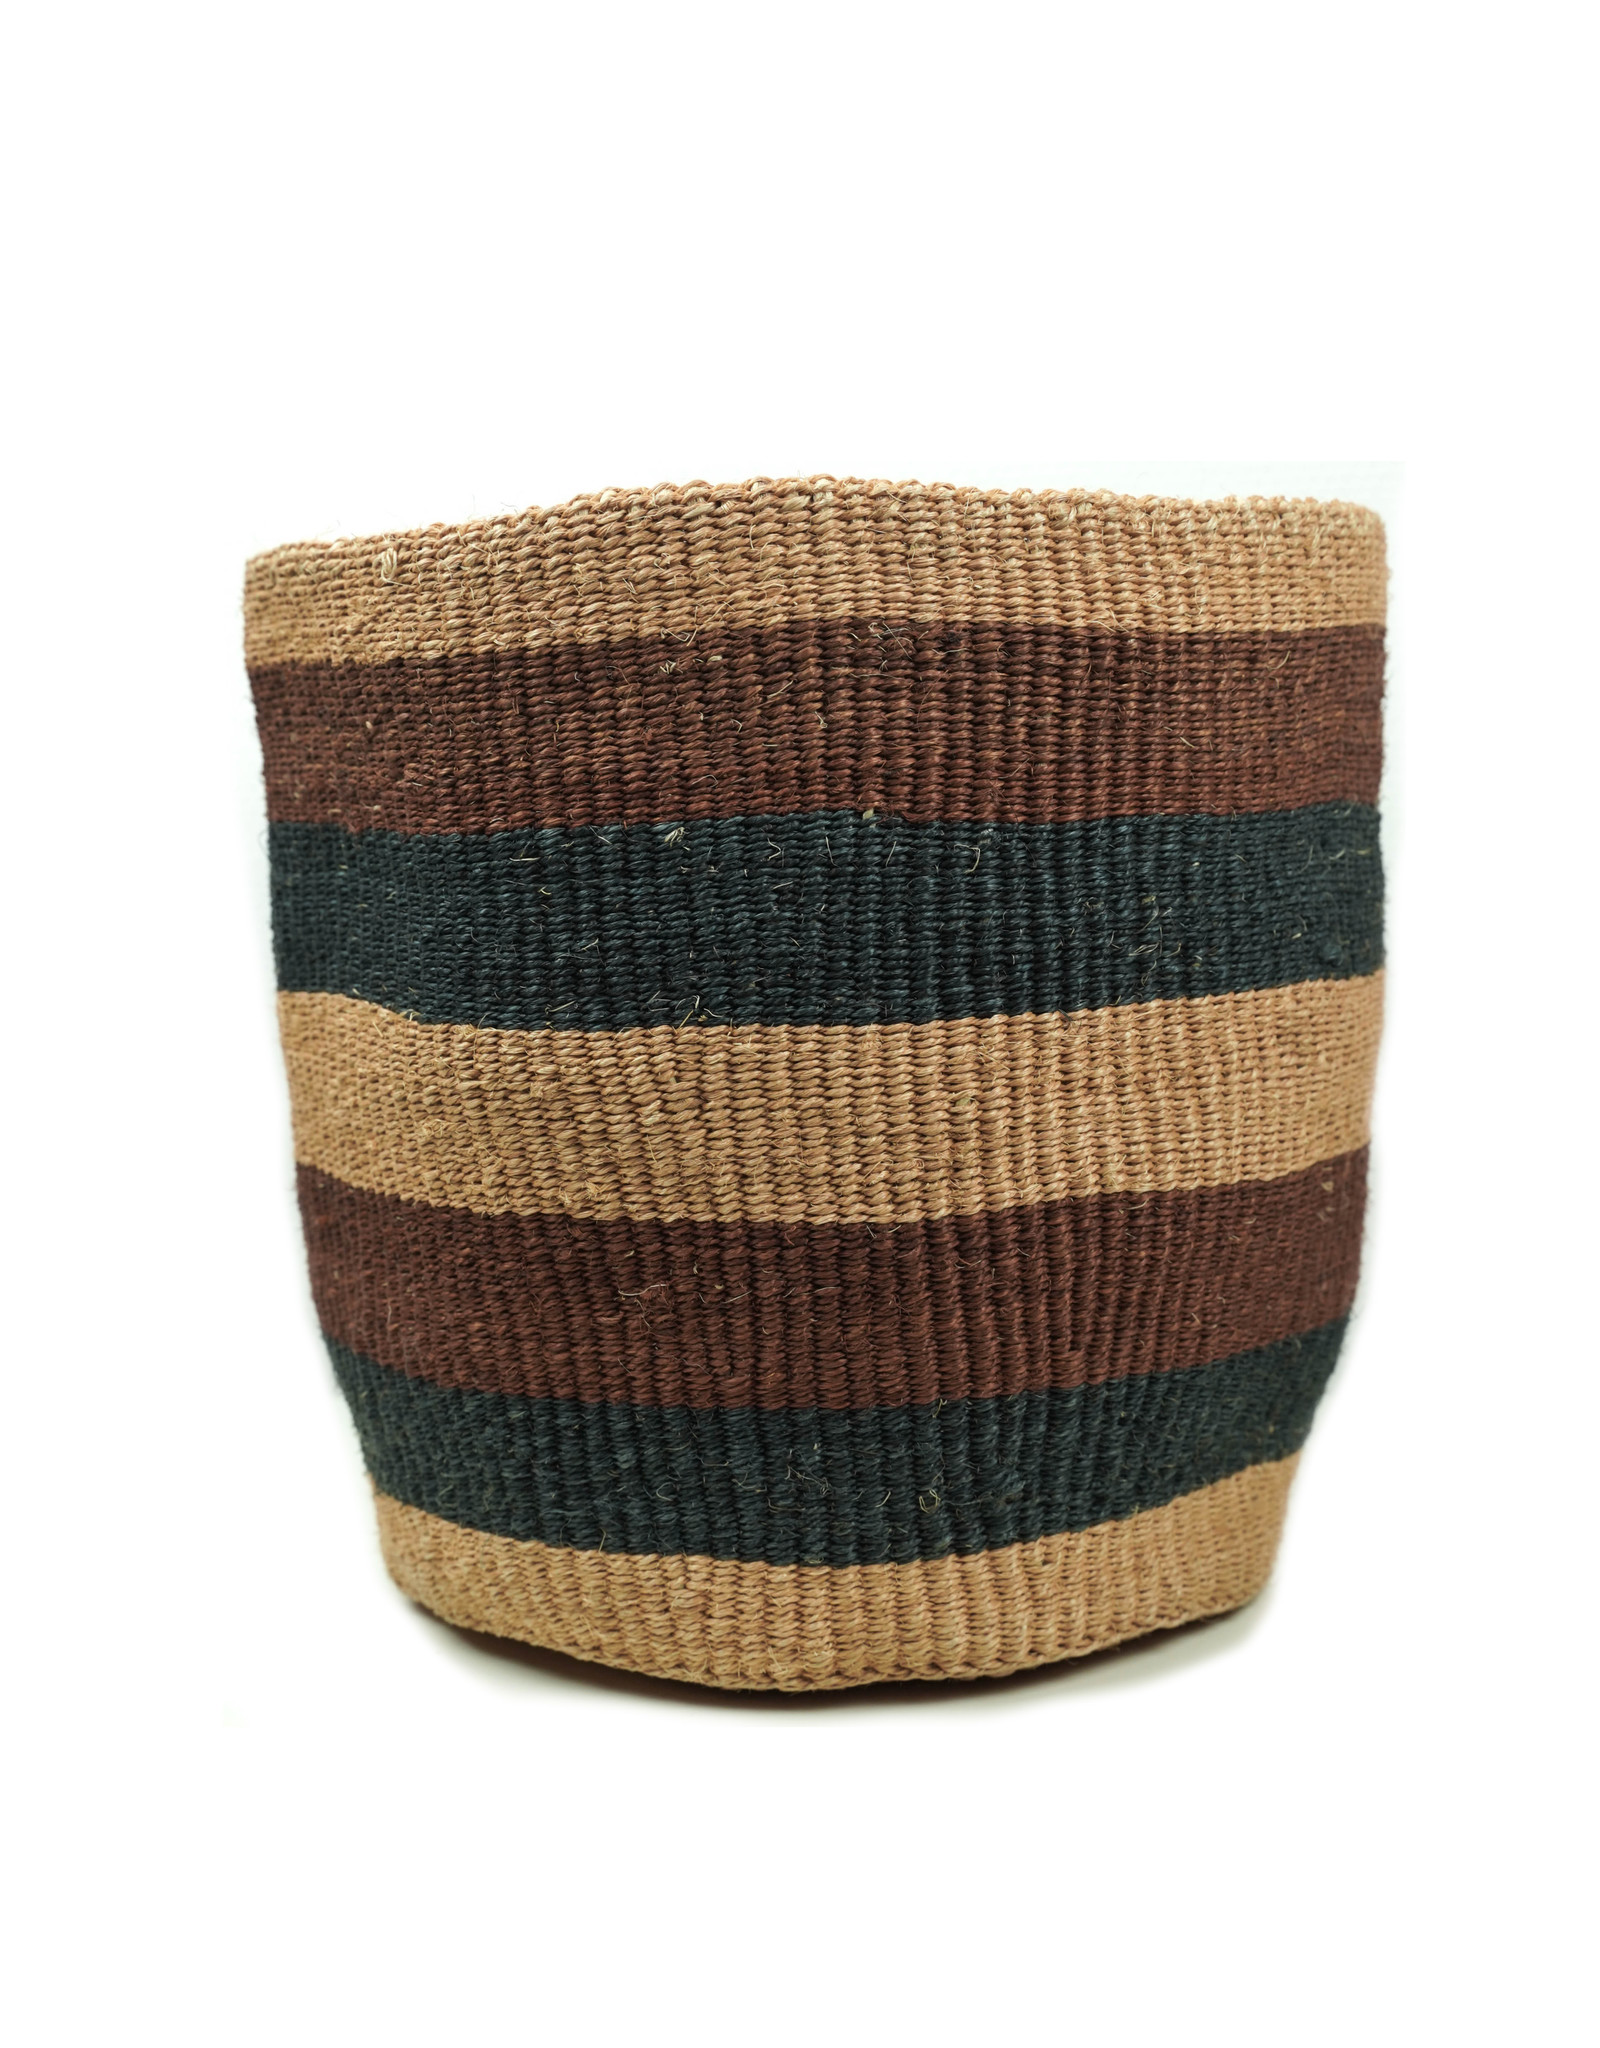 Maisha.Style Taita basket - reed brown black stripes - L1